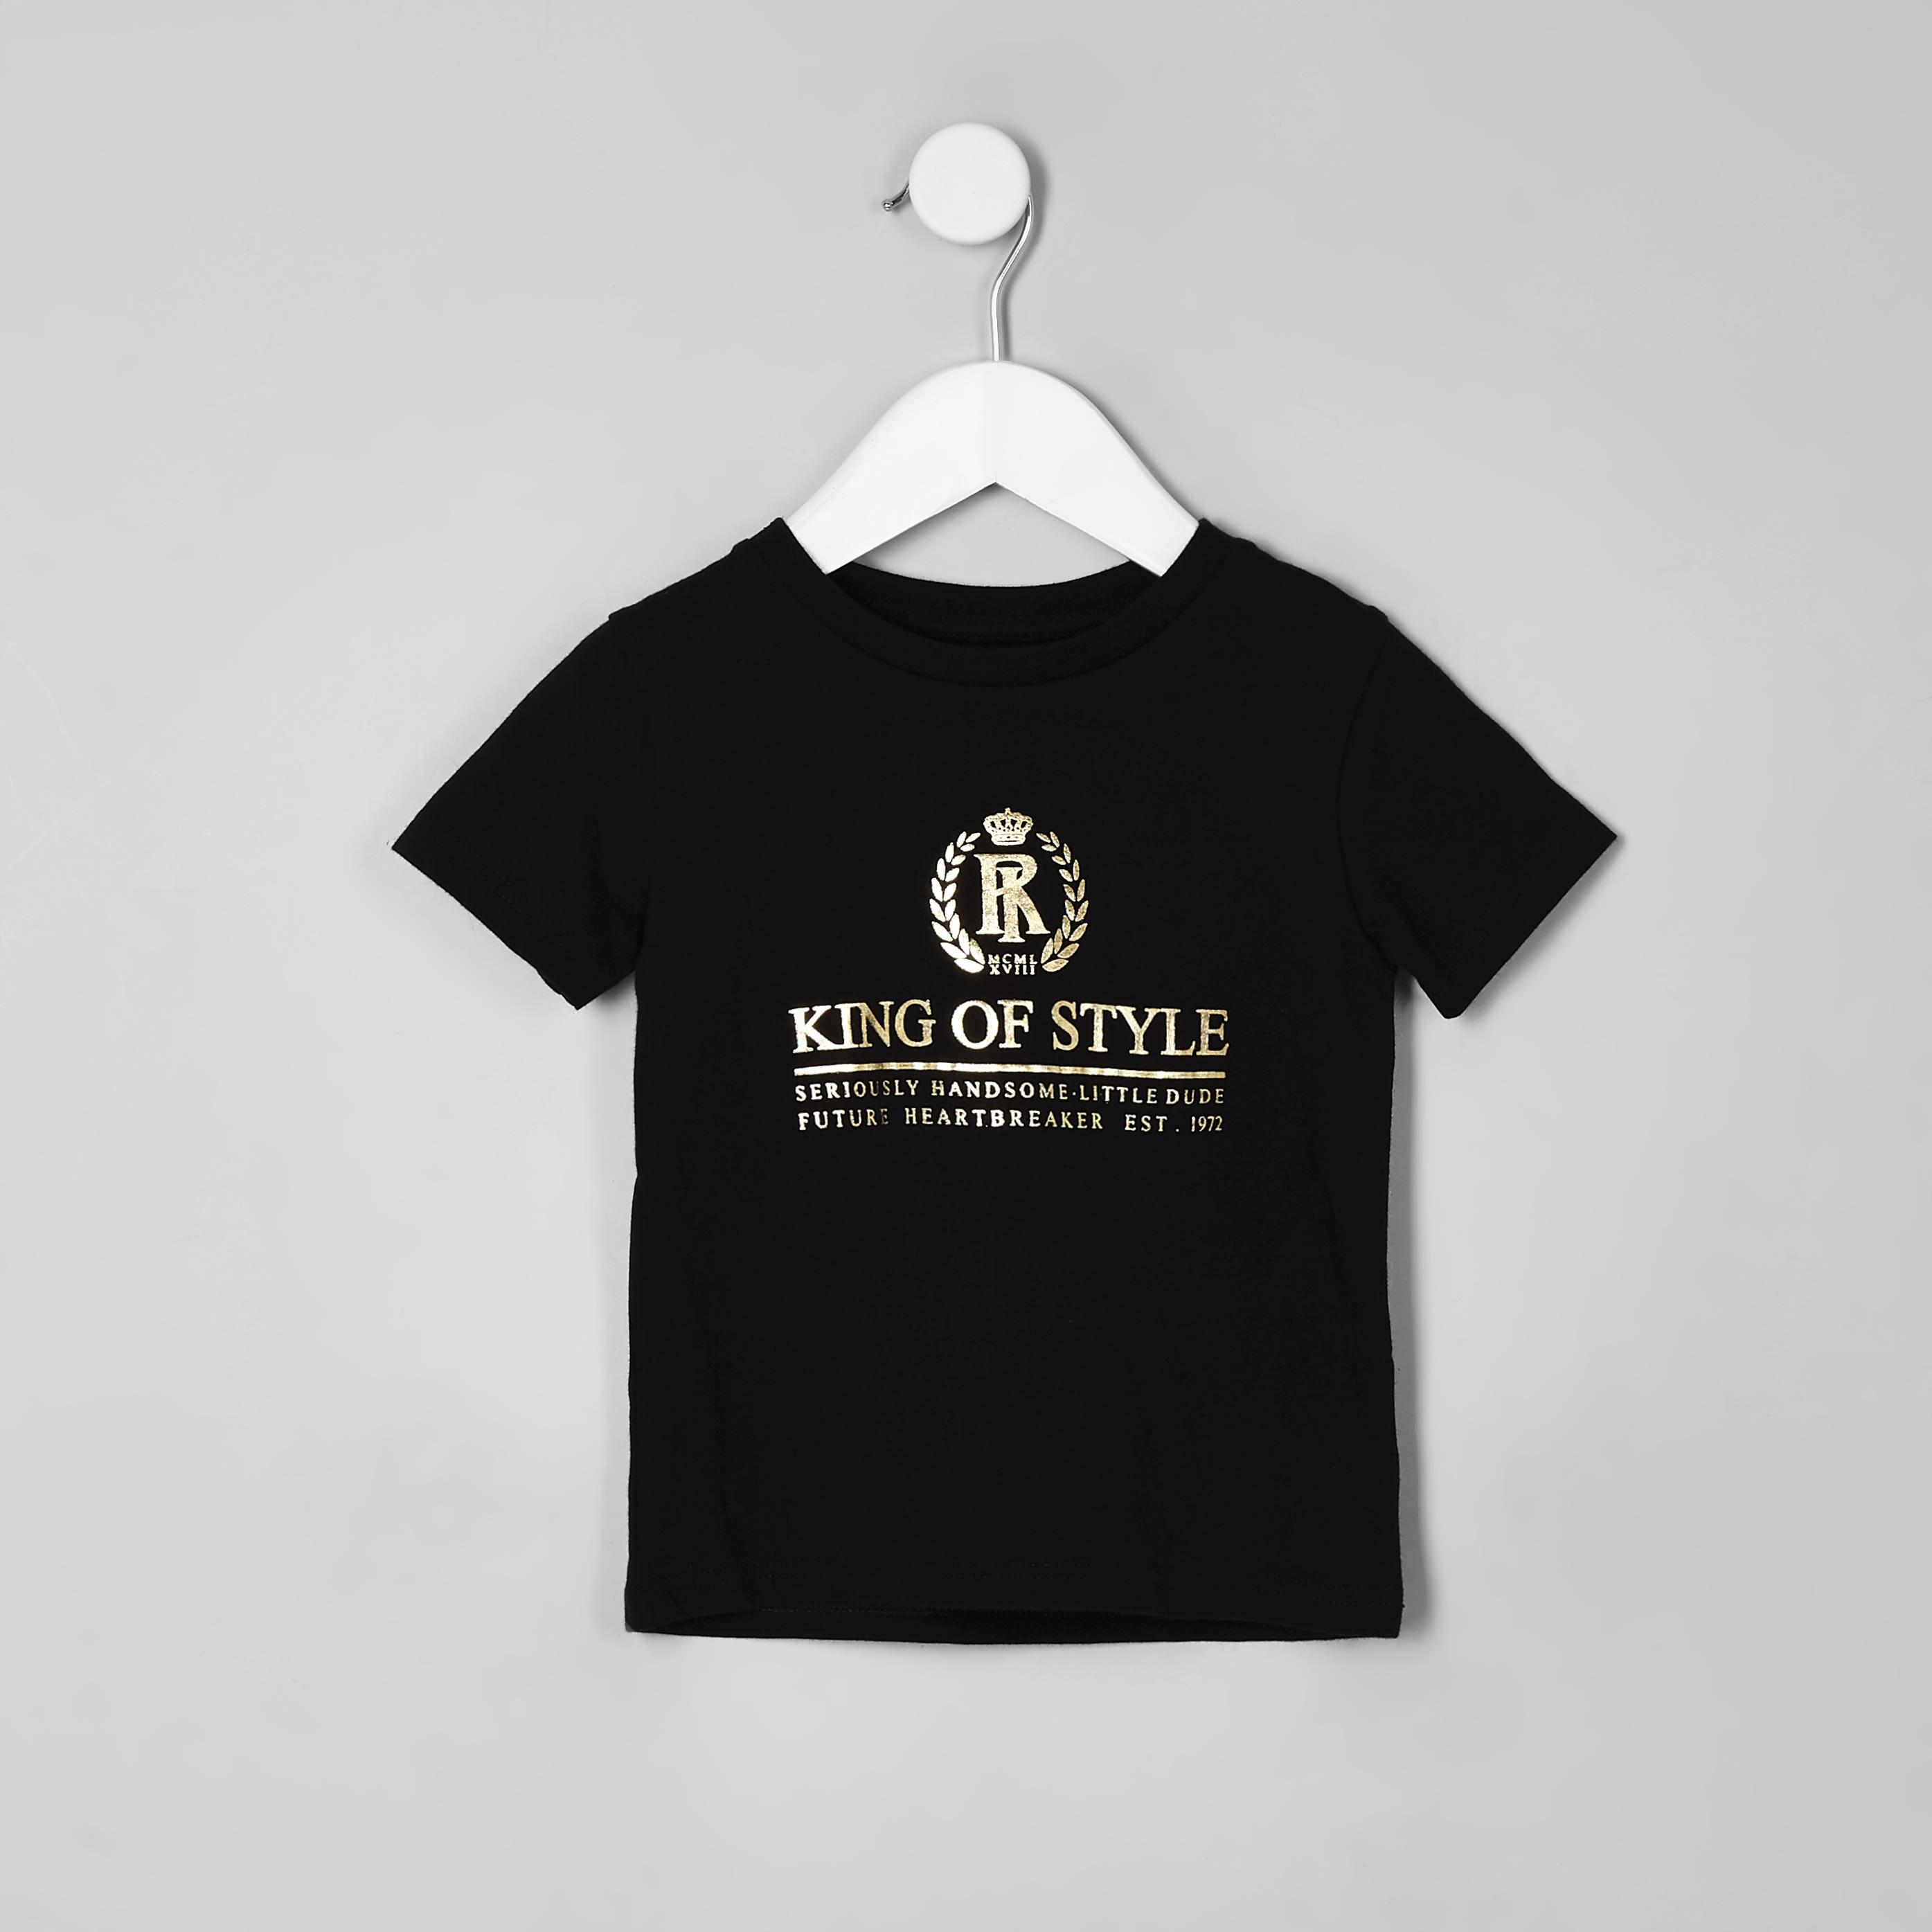 River Island Mens Baby Boys Black 'King of style' T-shirt (3-4 Yrs)